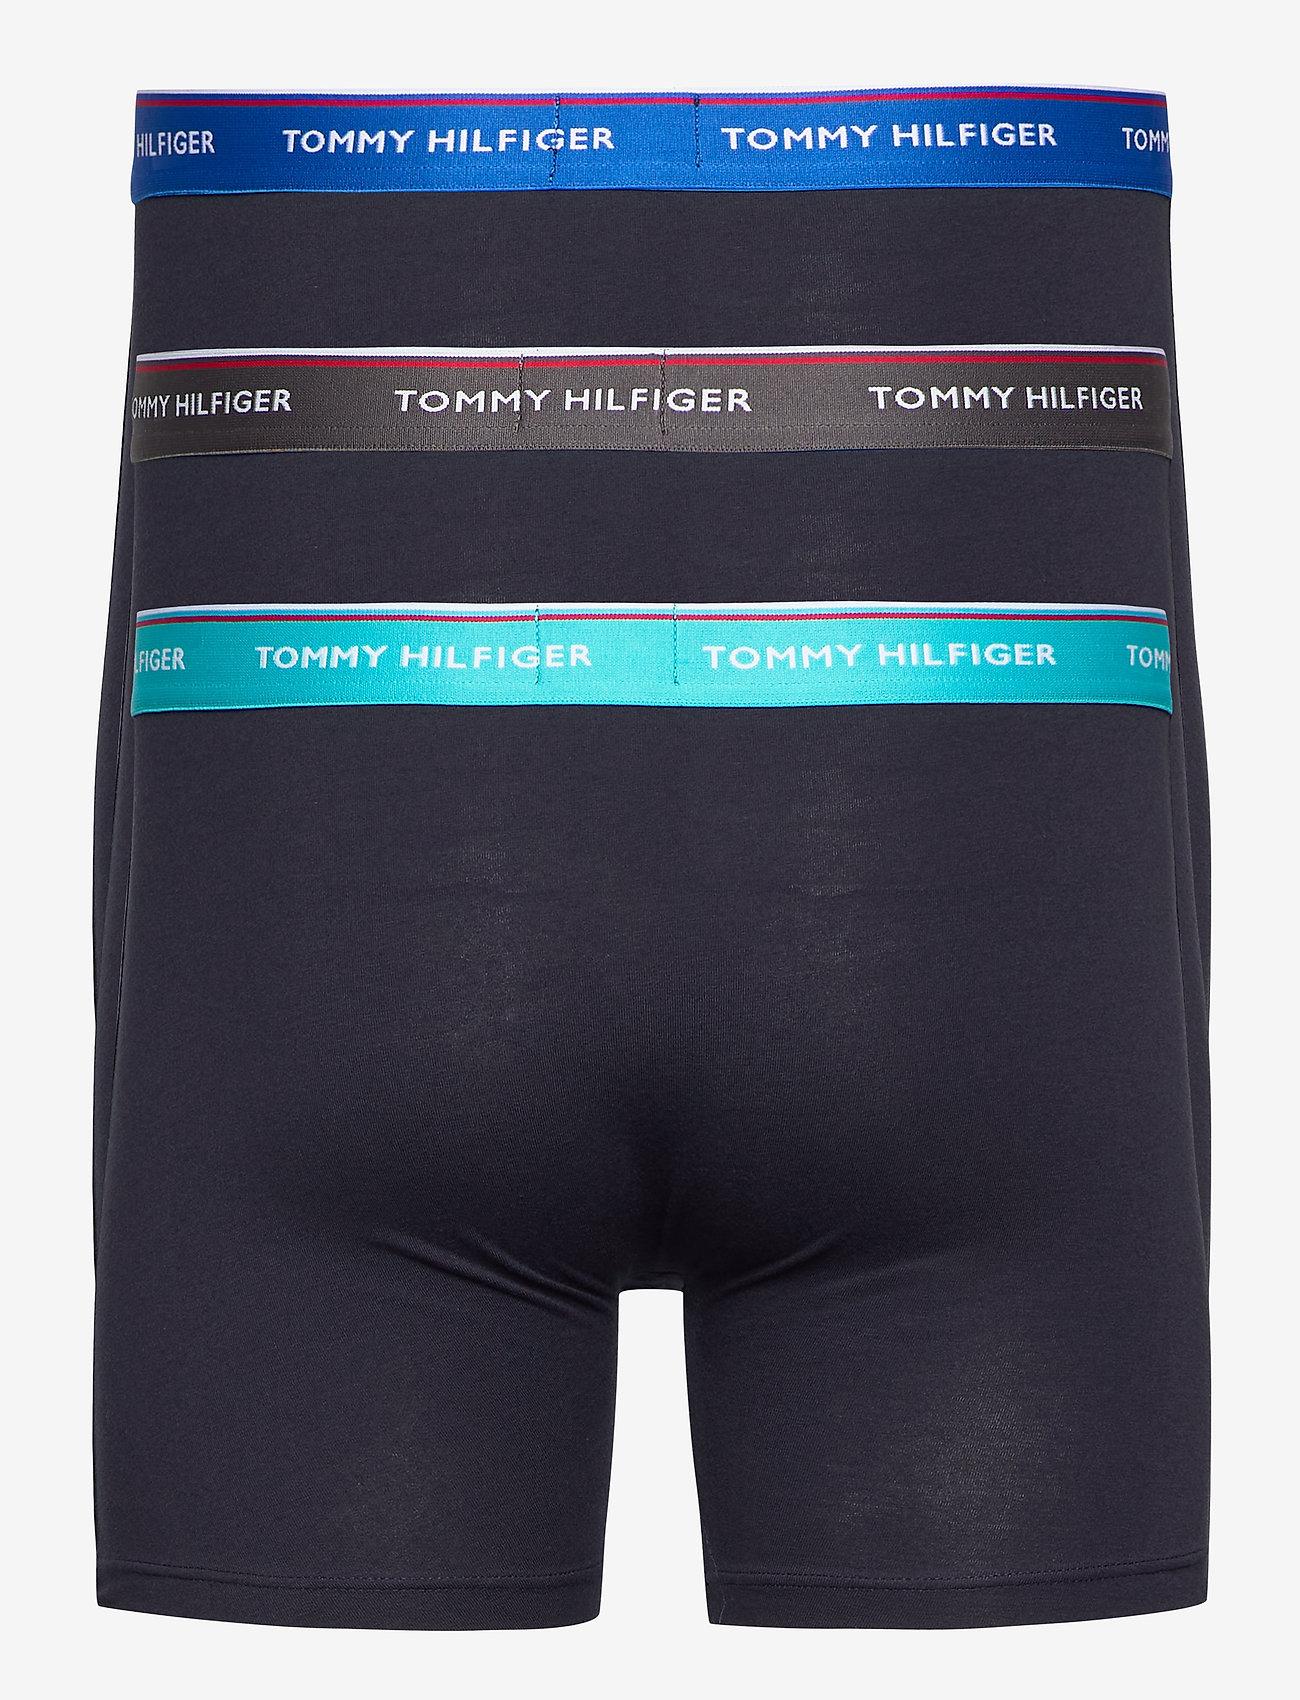 Tommy Hilfiger - 3P WB BOXER BRIEF - boxers - dark ash/aquatic teal/electric - 1